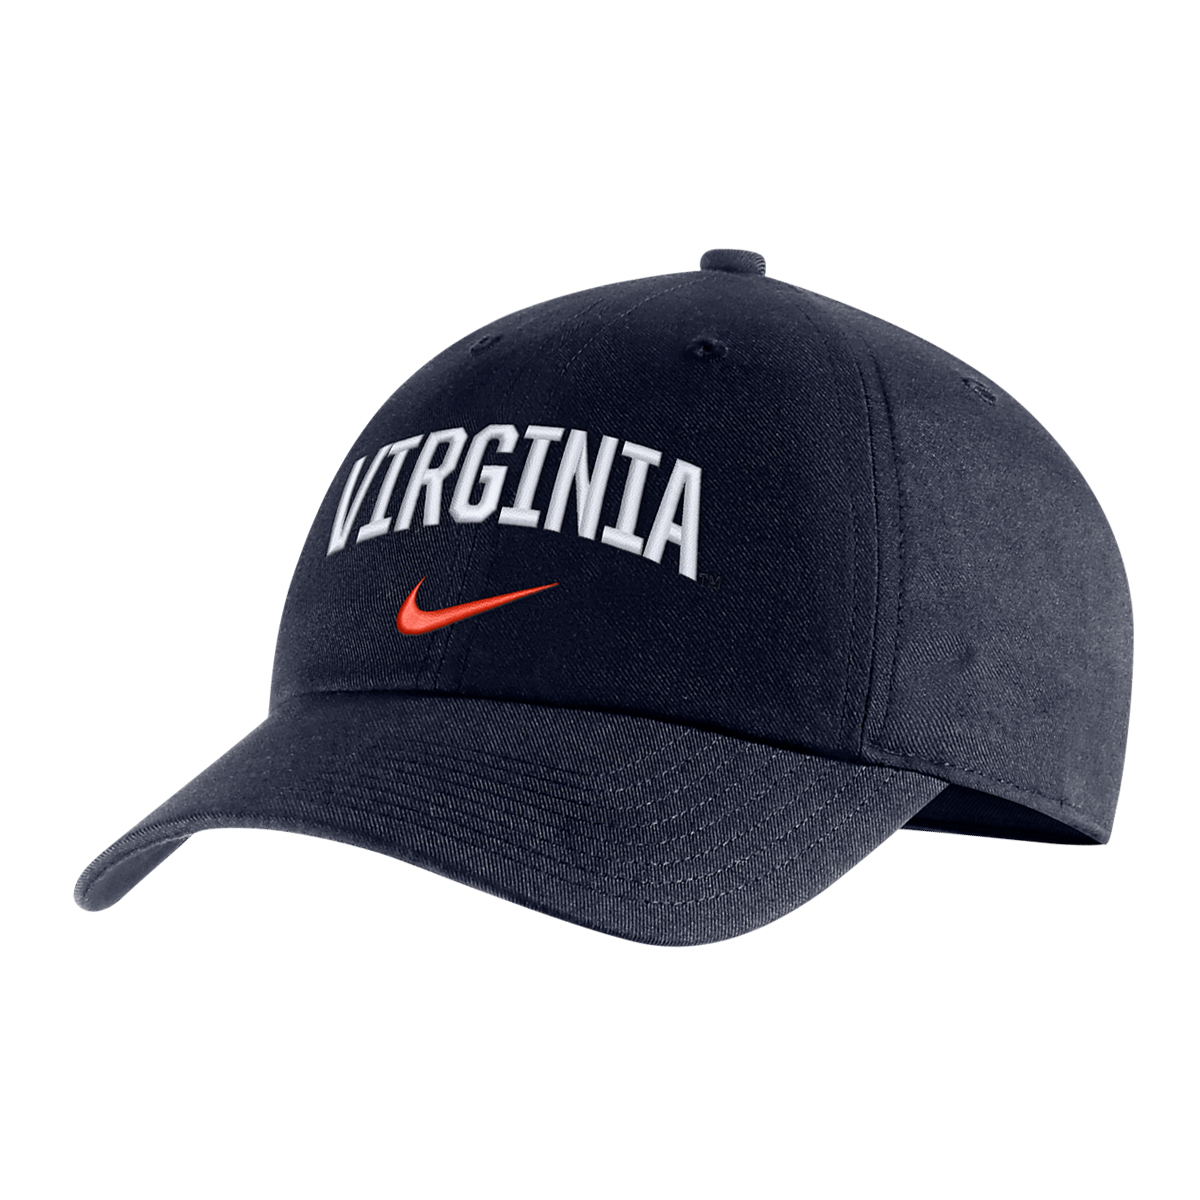 University of Virginia Nike Heritage86 Navy Hat